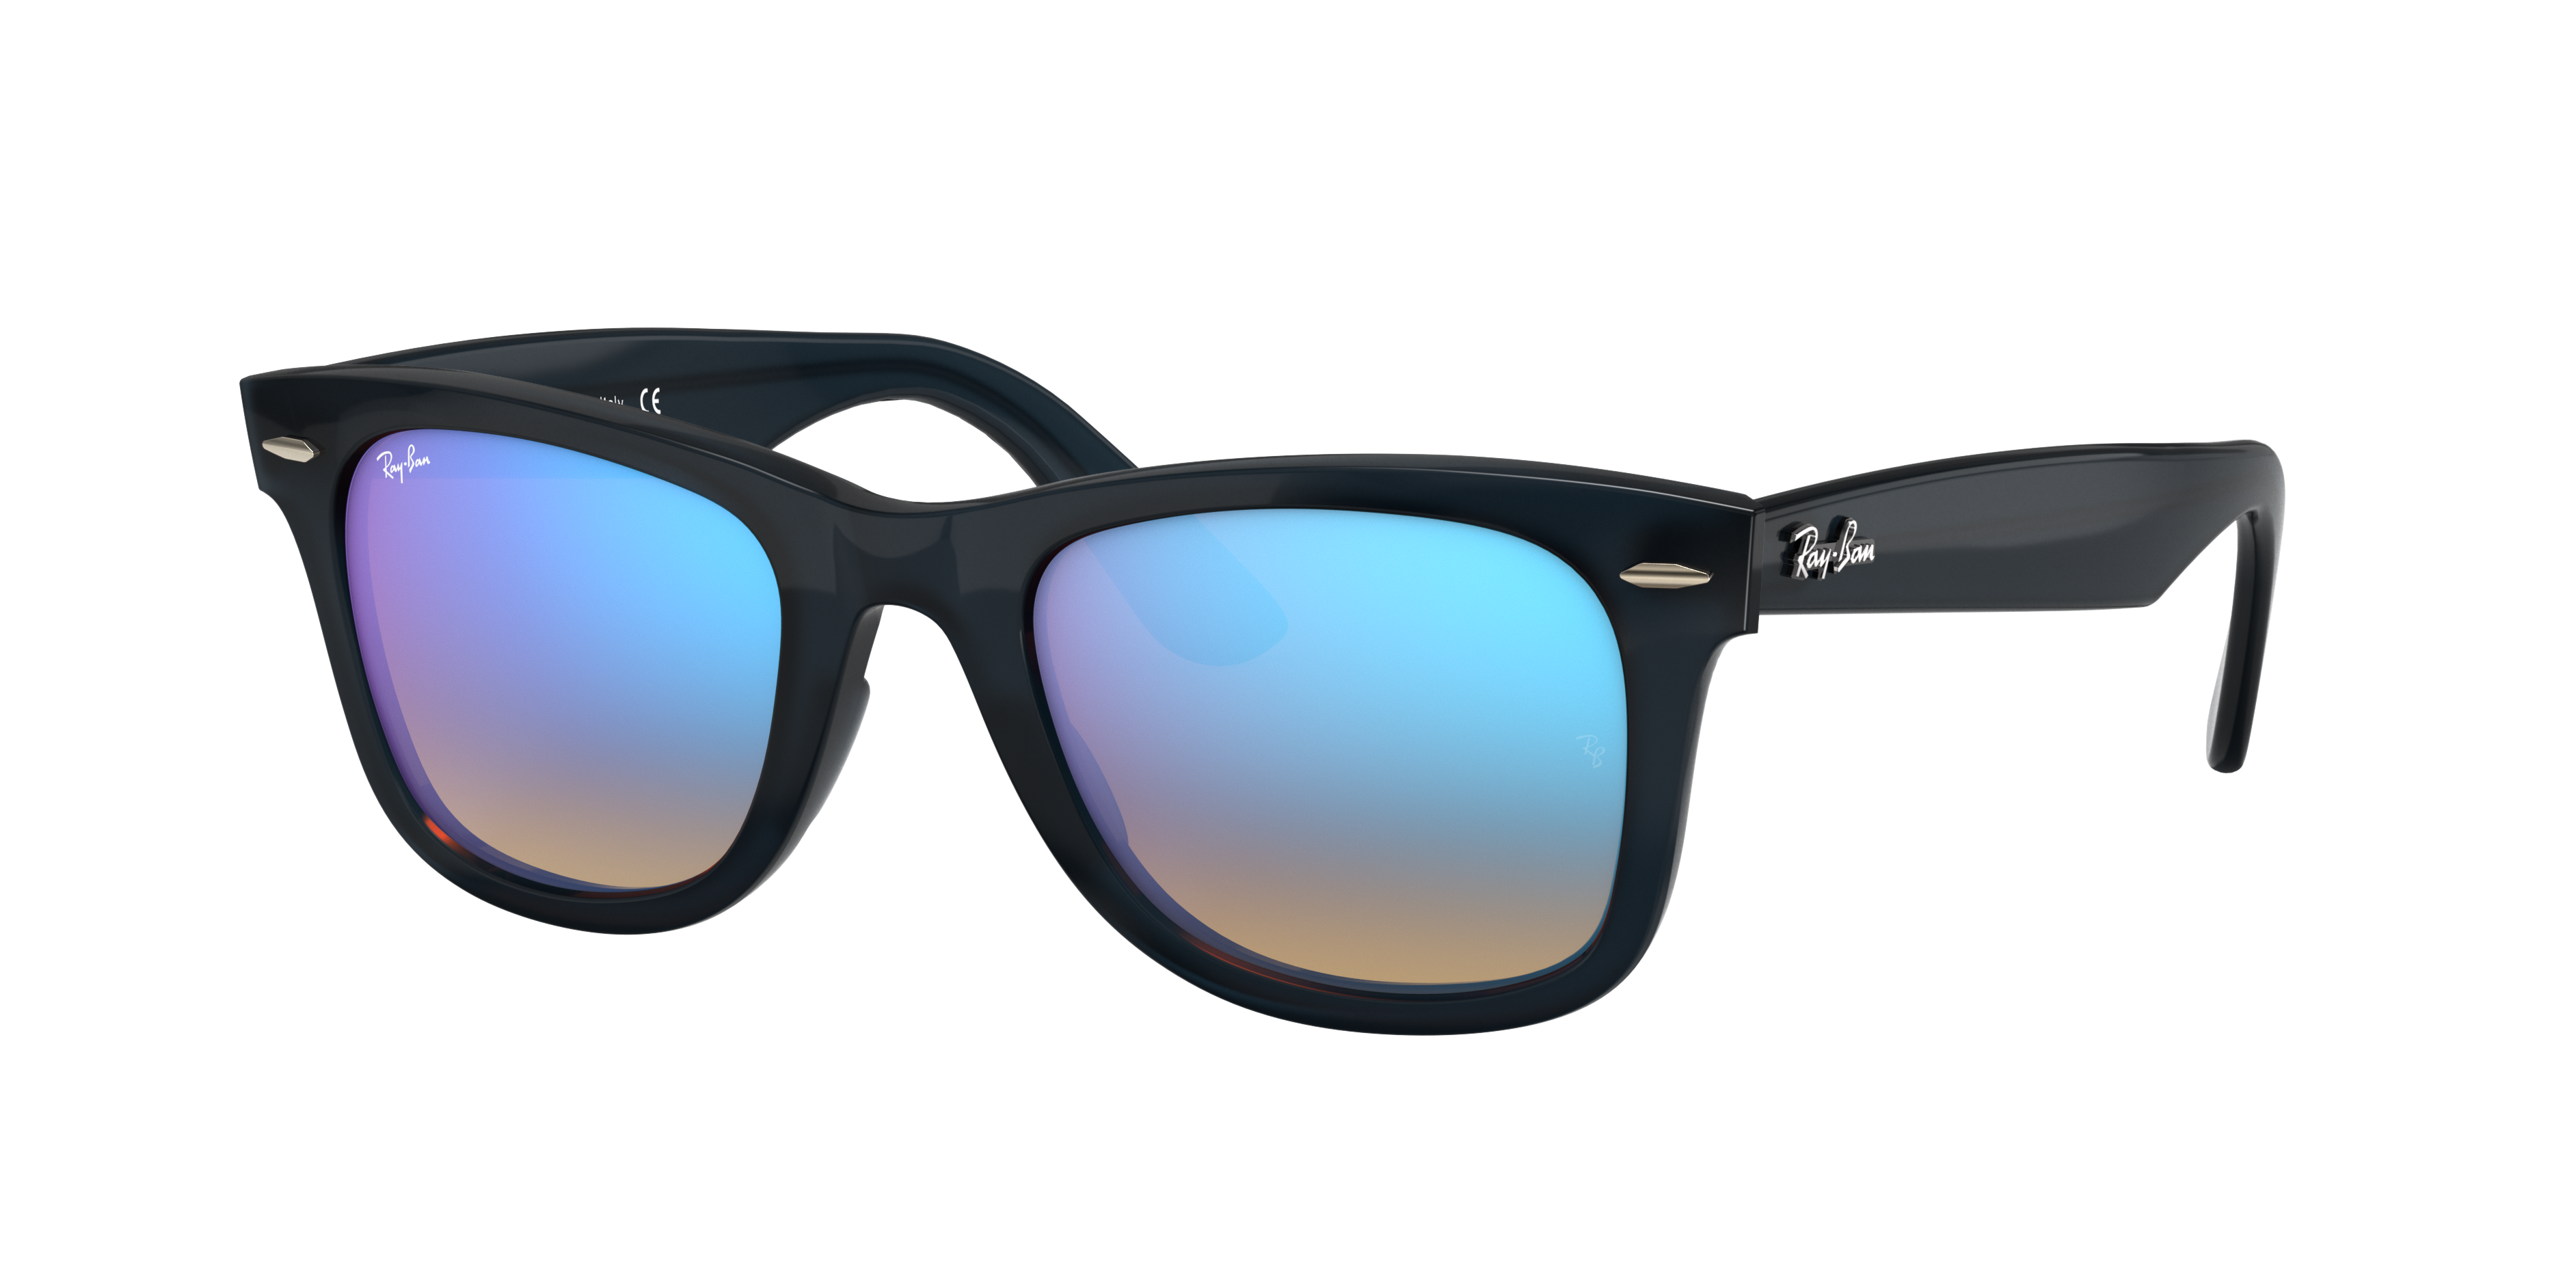 Ray-Ban Wayfarer Ease Blue, Blue Lenses - RB4340